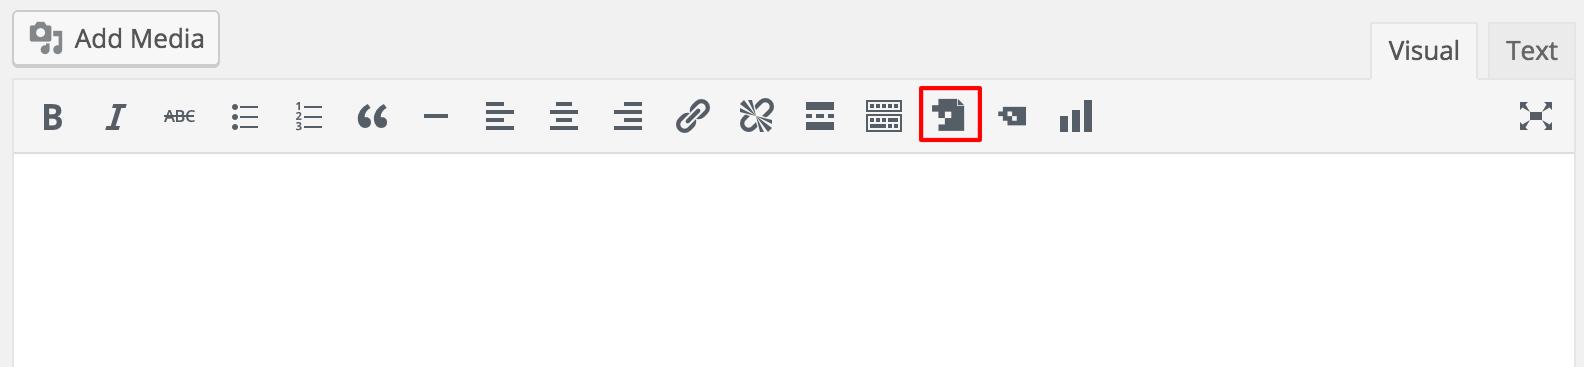 Insert Report Builder in WP Visual Editor